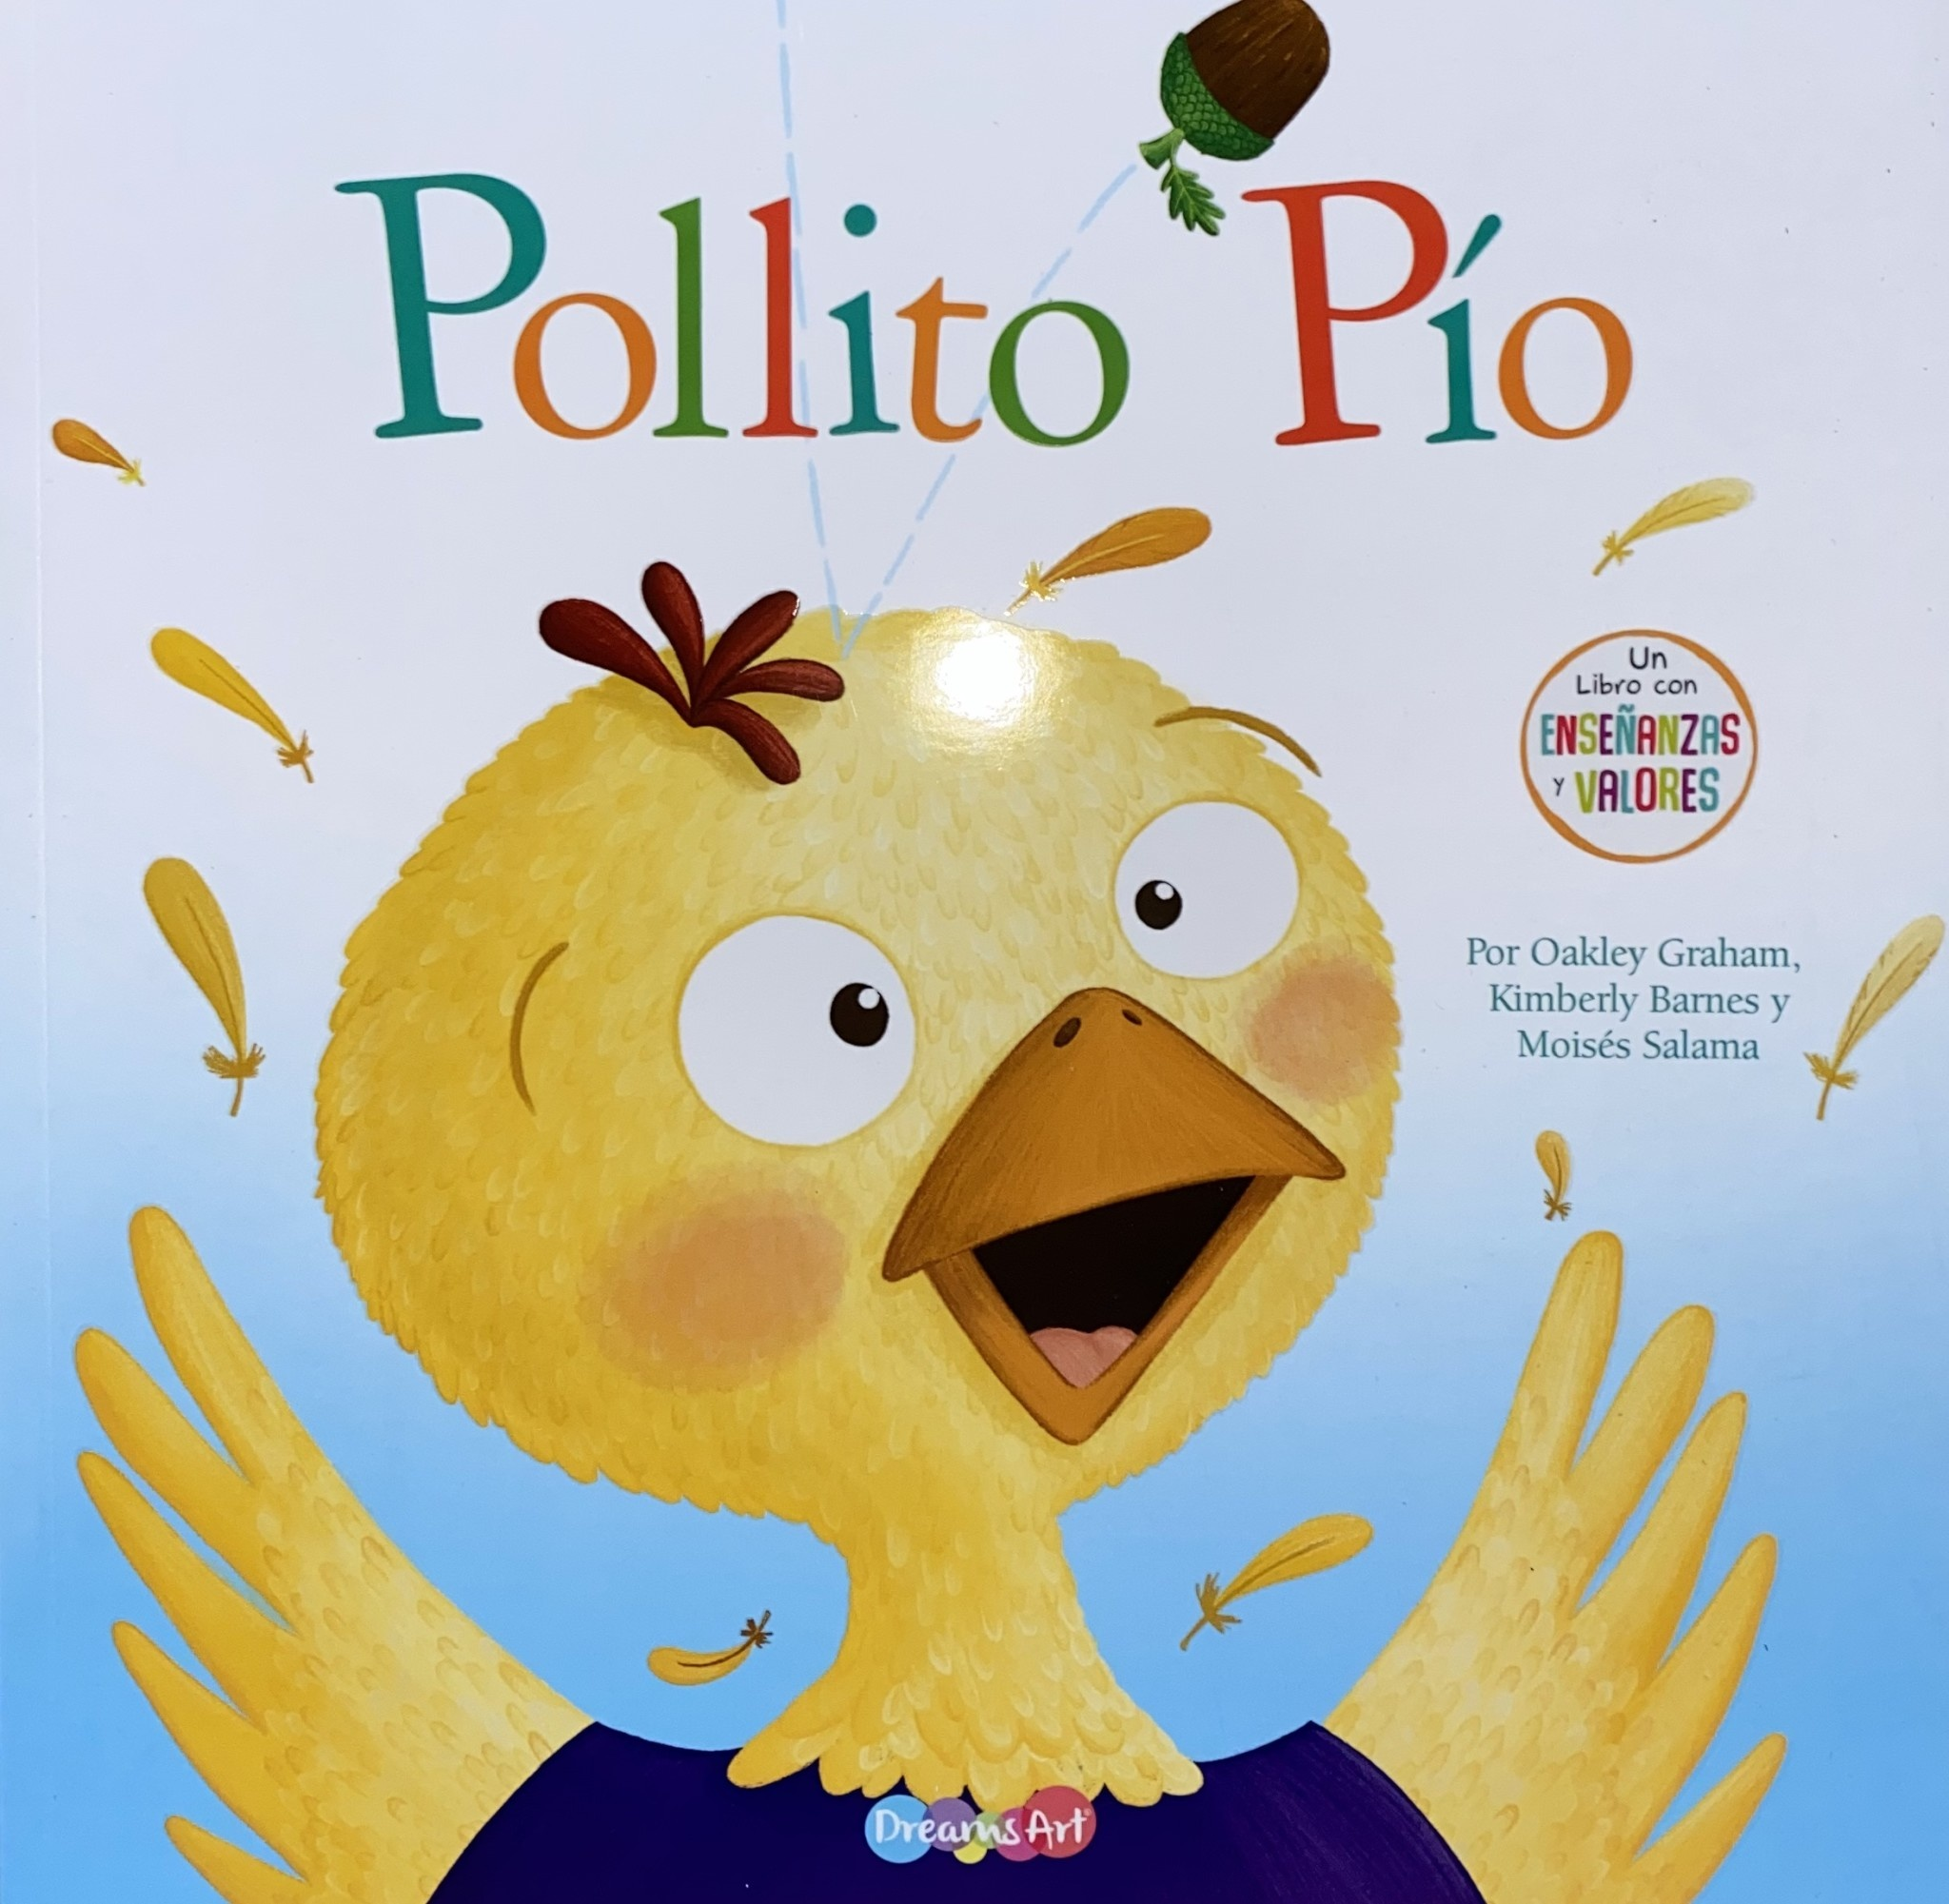 Pollito Pio